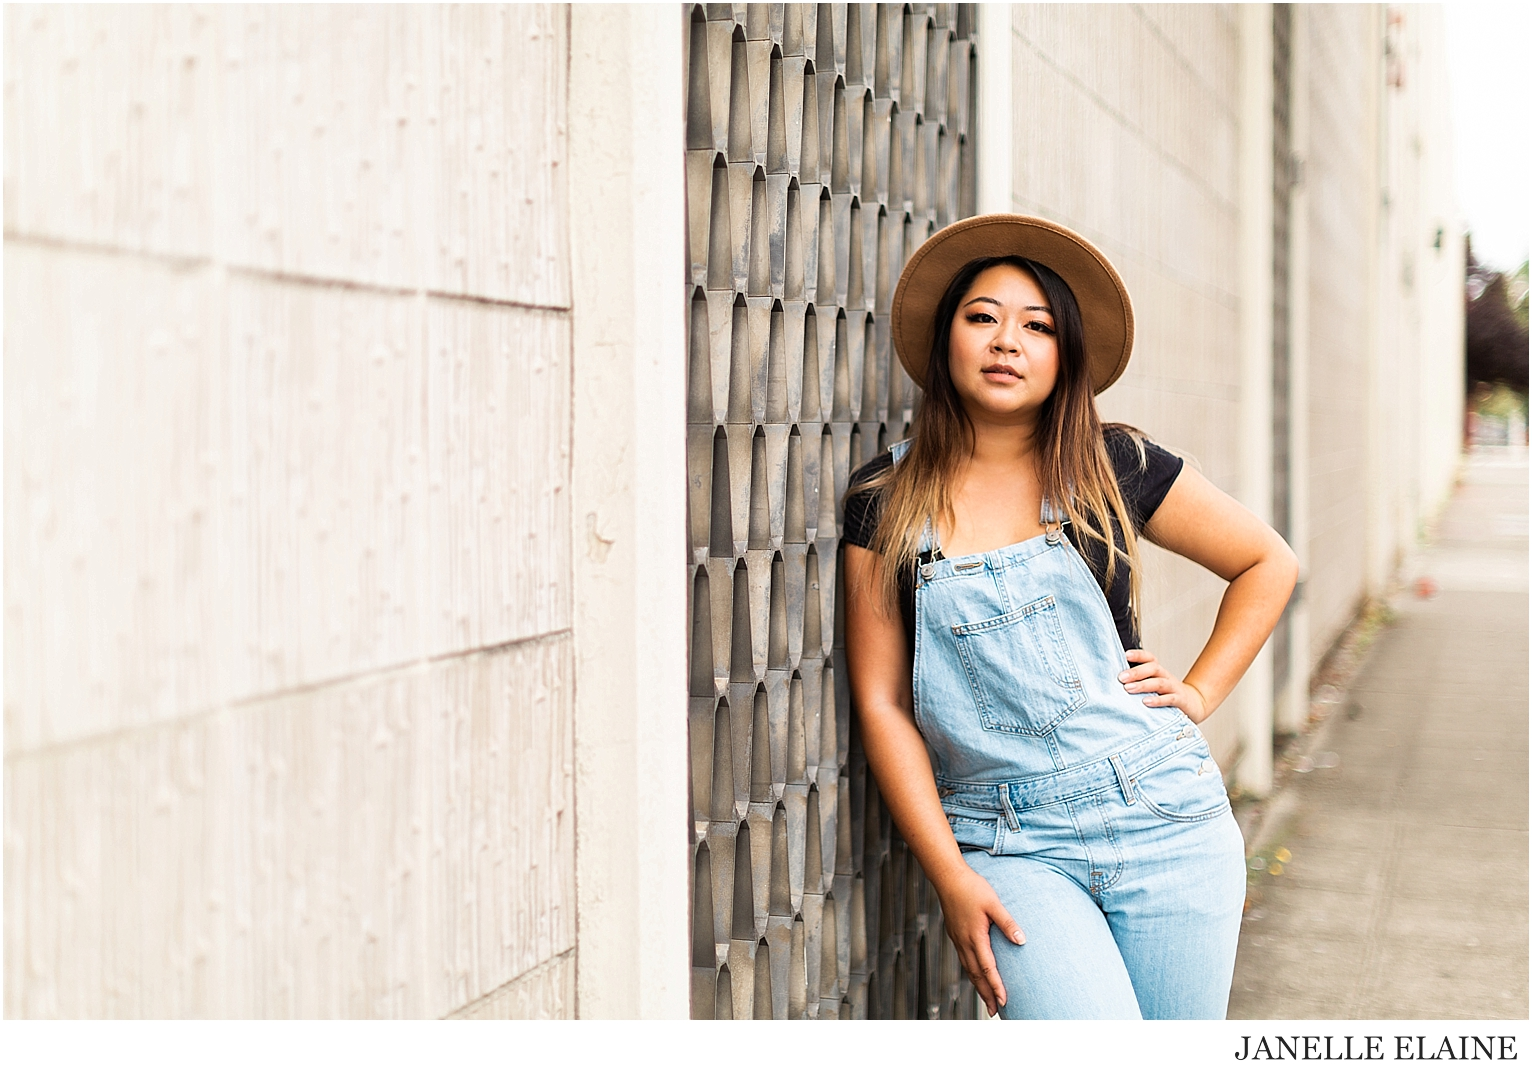 Aiko-Seattle WA-lifestyle photoshoot-Renton-Janelle Elaine Photography-15.jpg